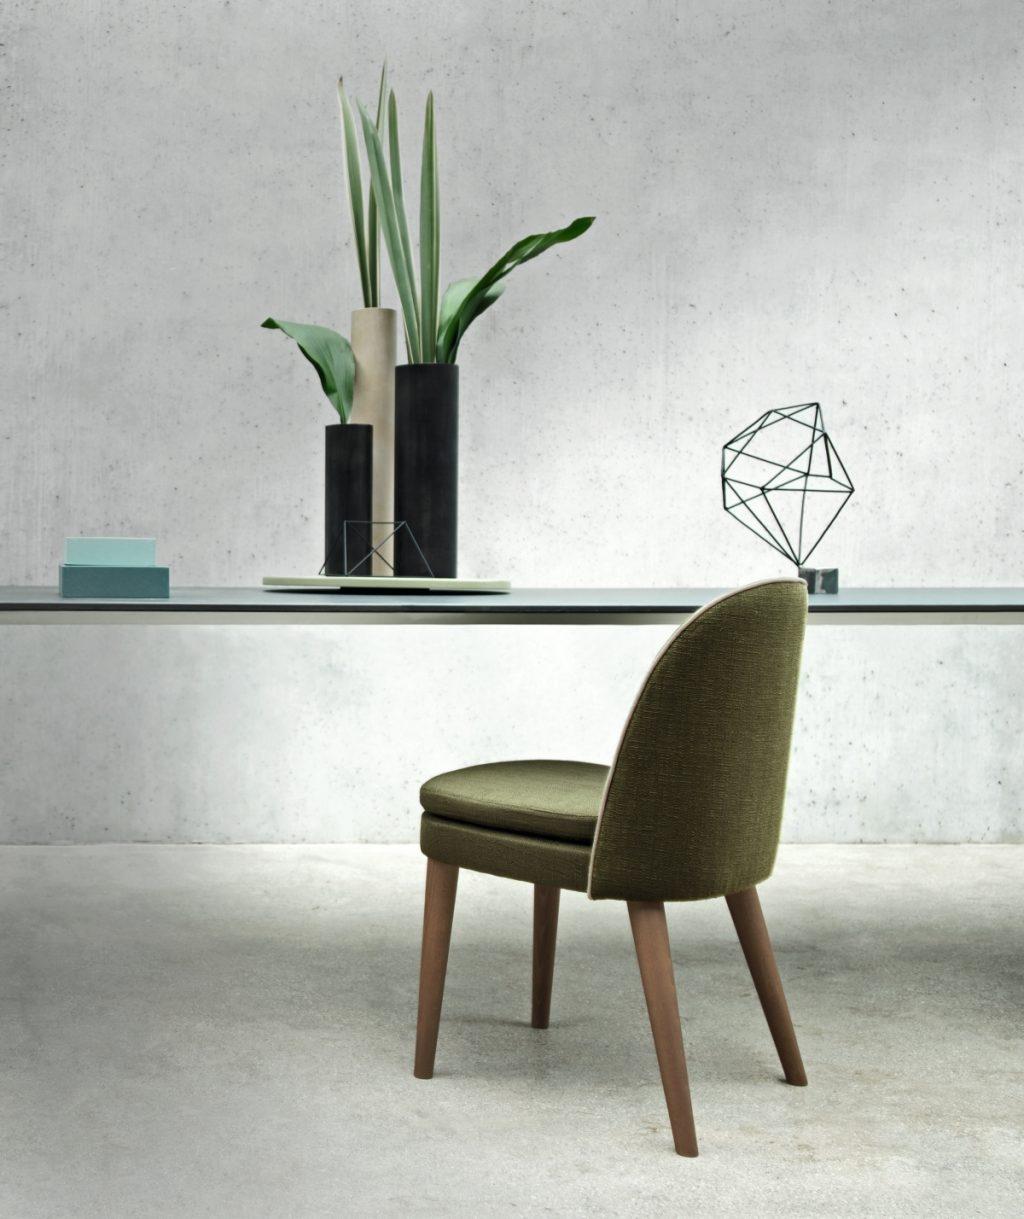 Diseño de madera muy Carmen Matteo Thun Atelier